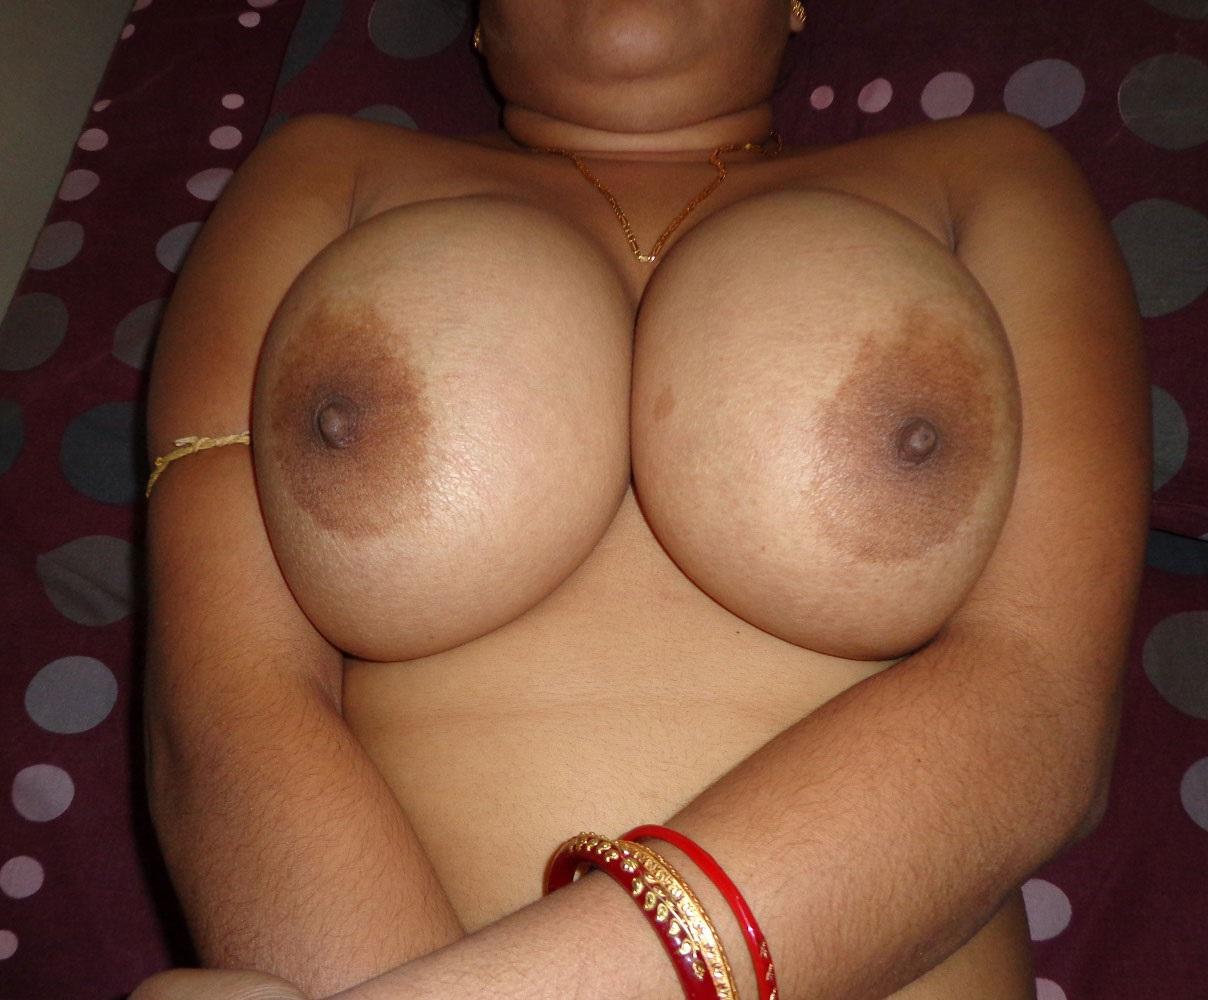 Indian Big Boobs Live Sex Photo